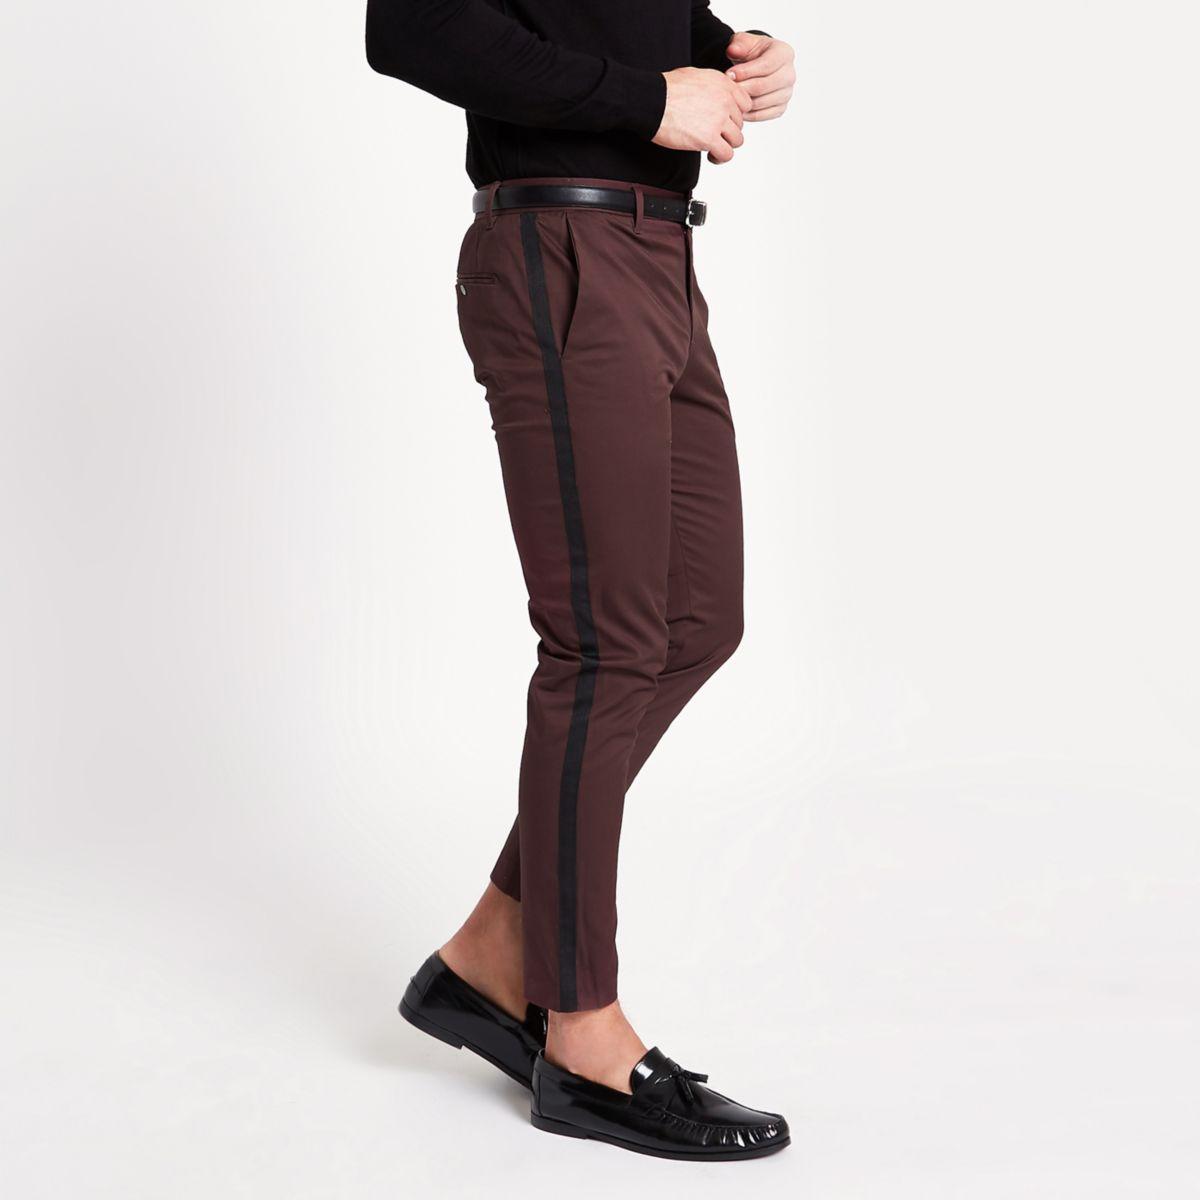 Burgundy tape side skinny fit chino pants